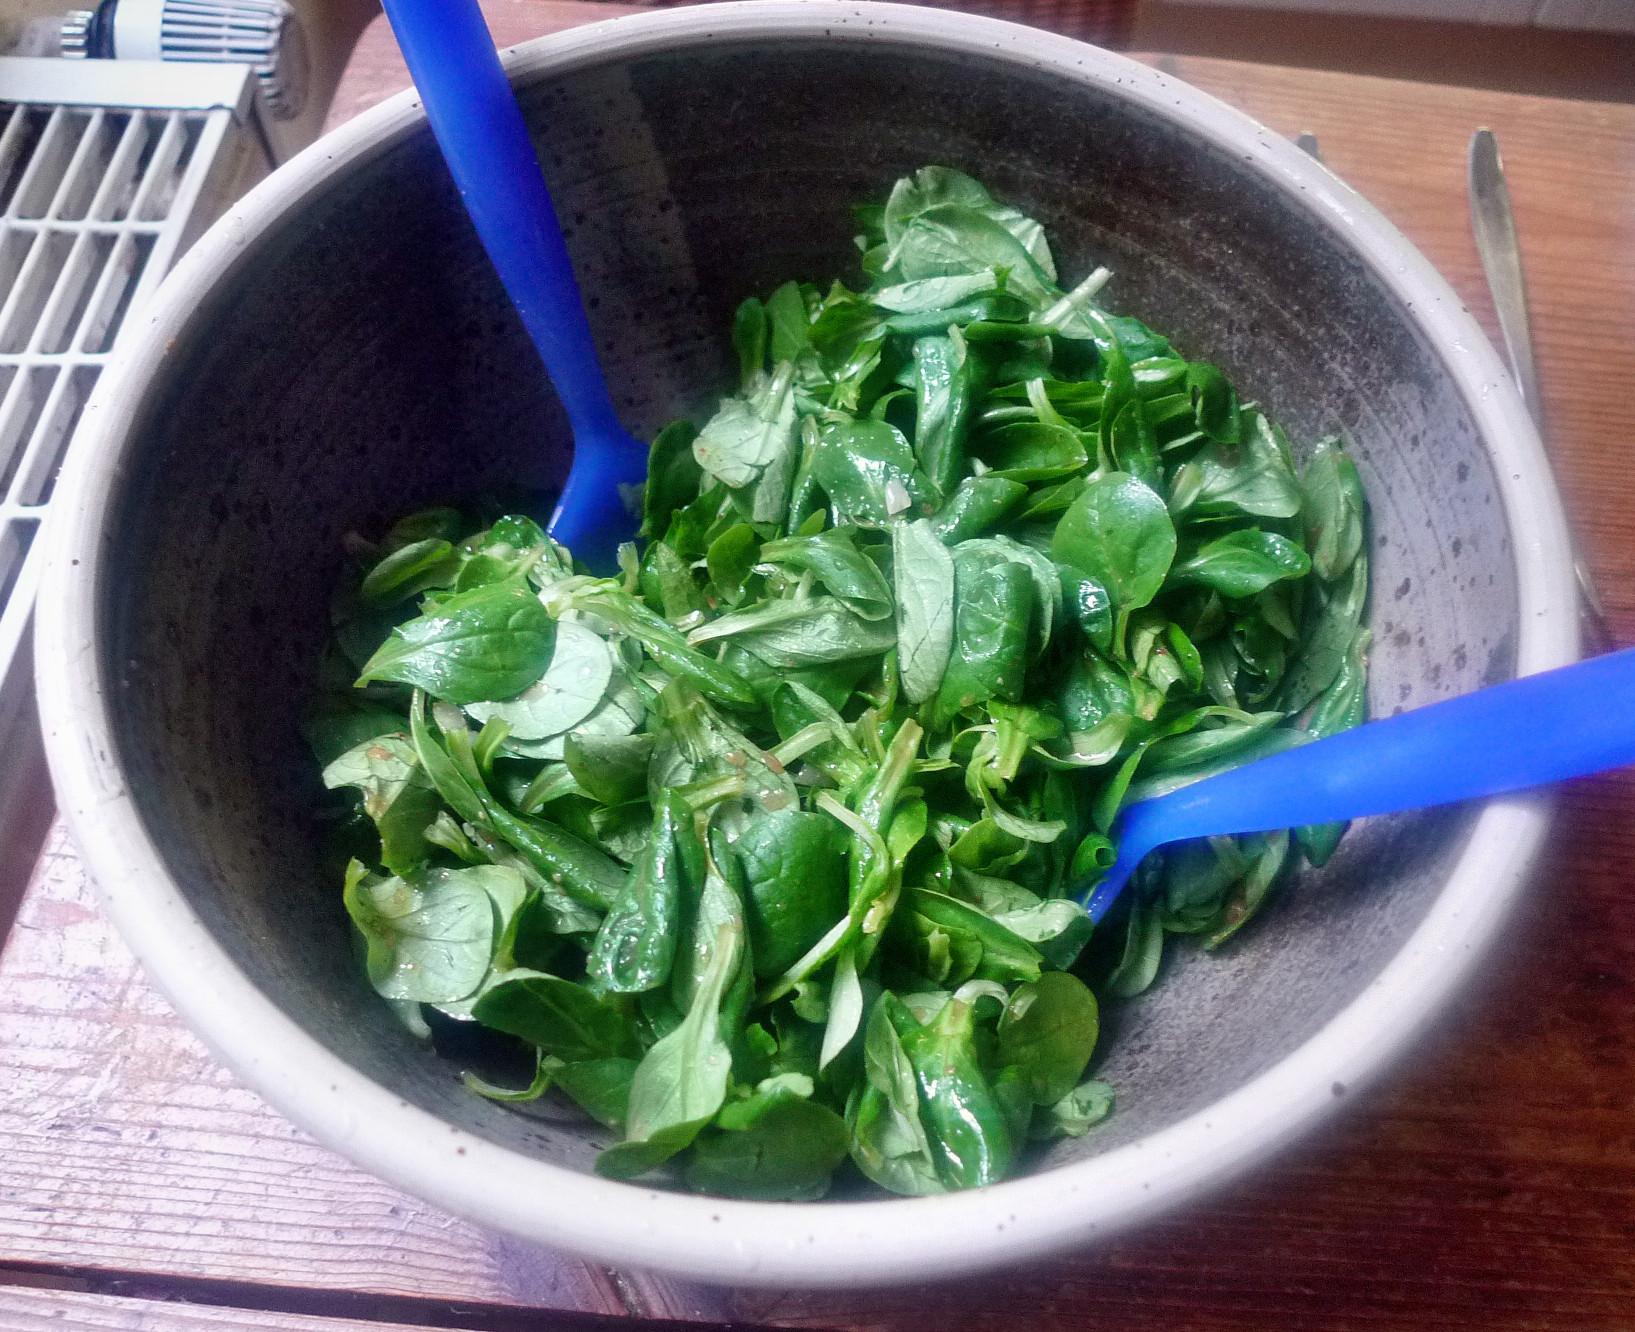 Pimentos-Paprika-Kartoffel-Salat-Buttermilch- 28.9.14   (3)